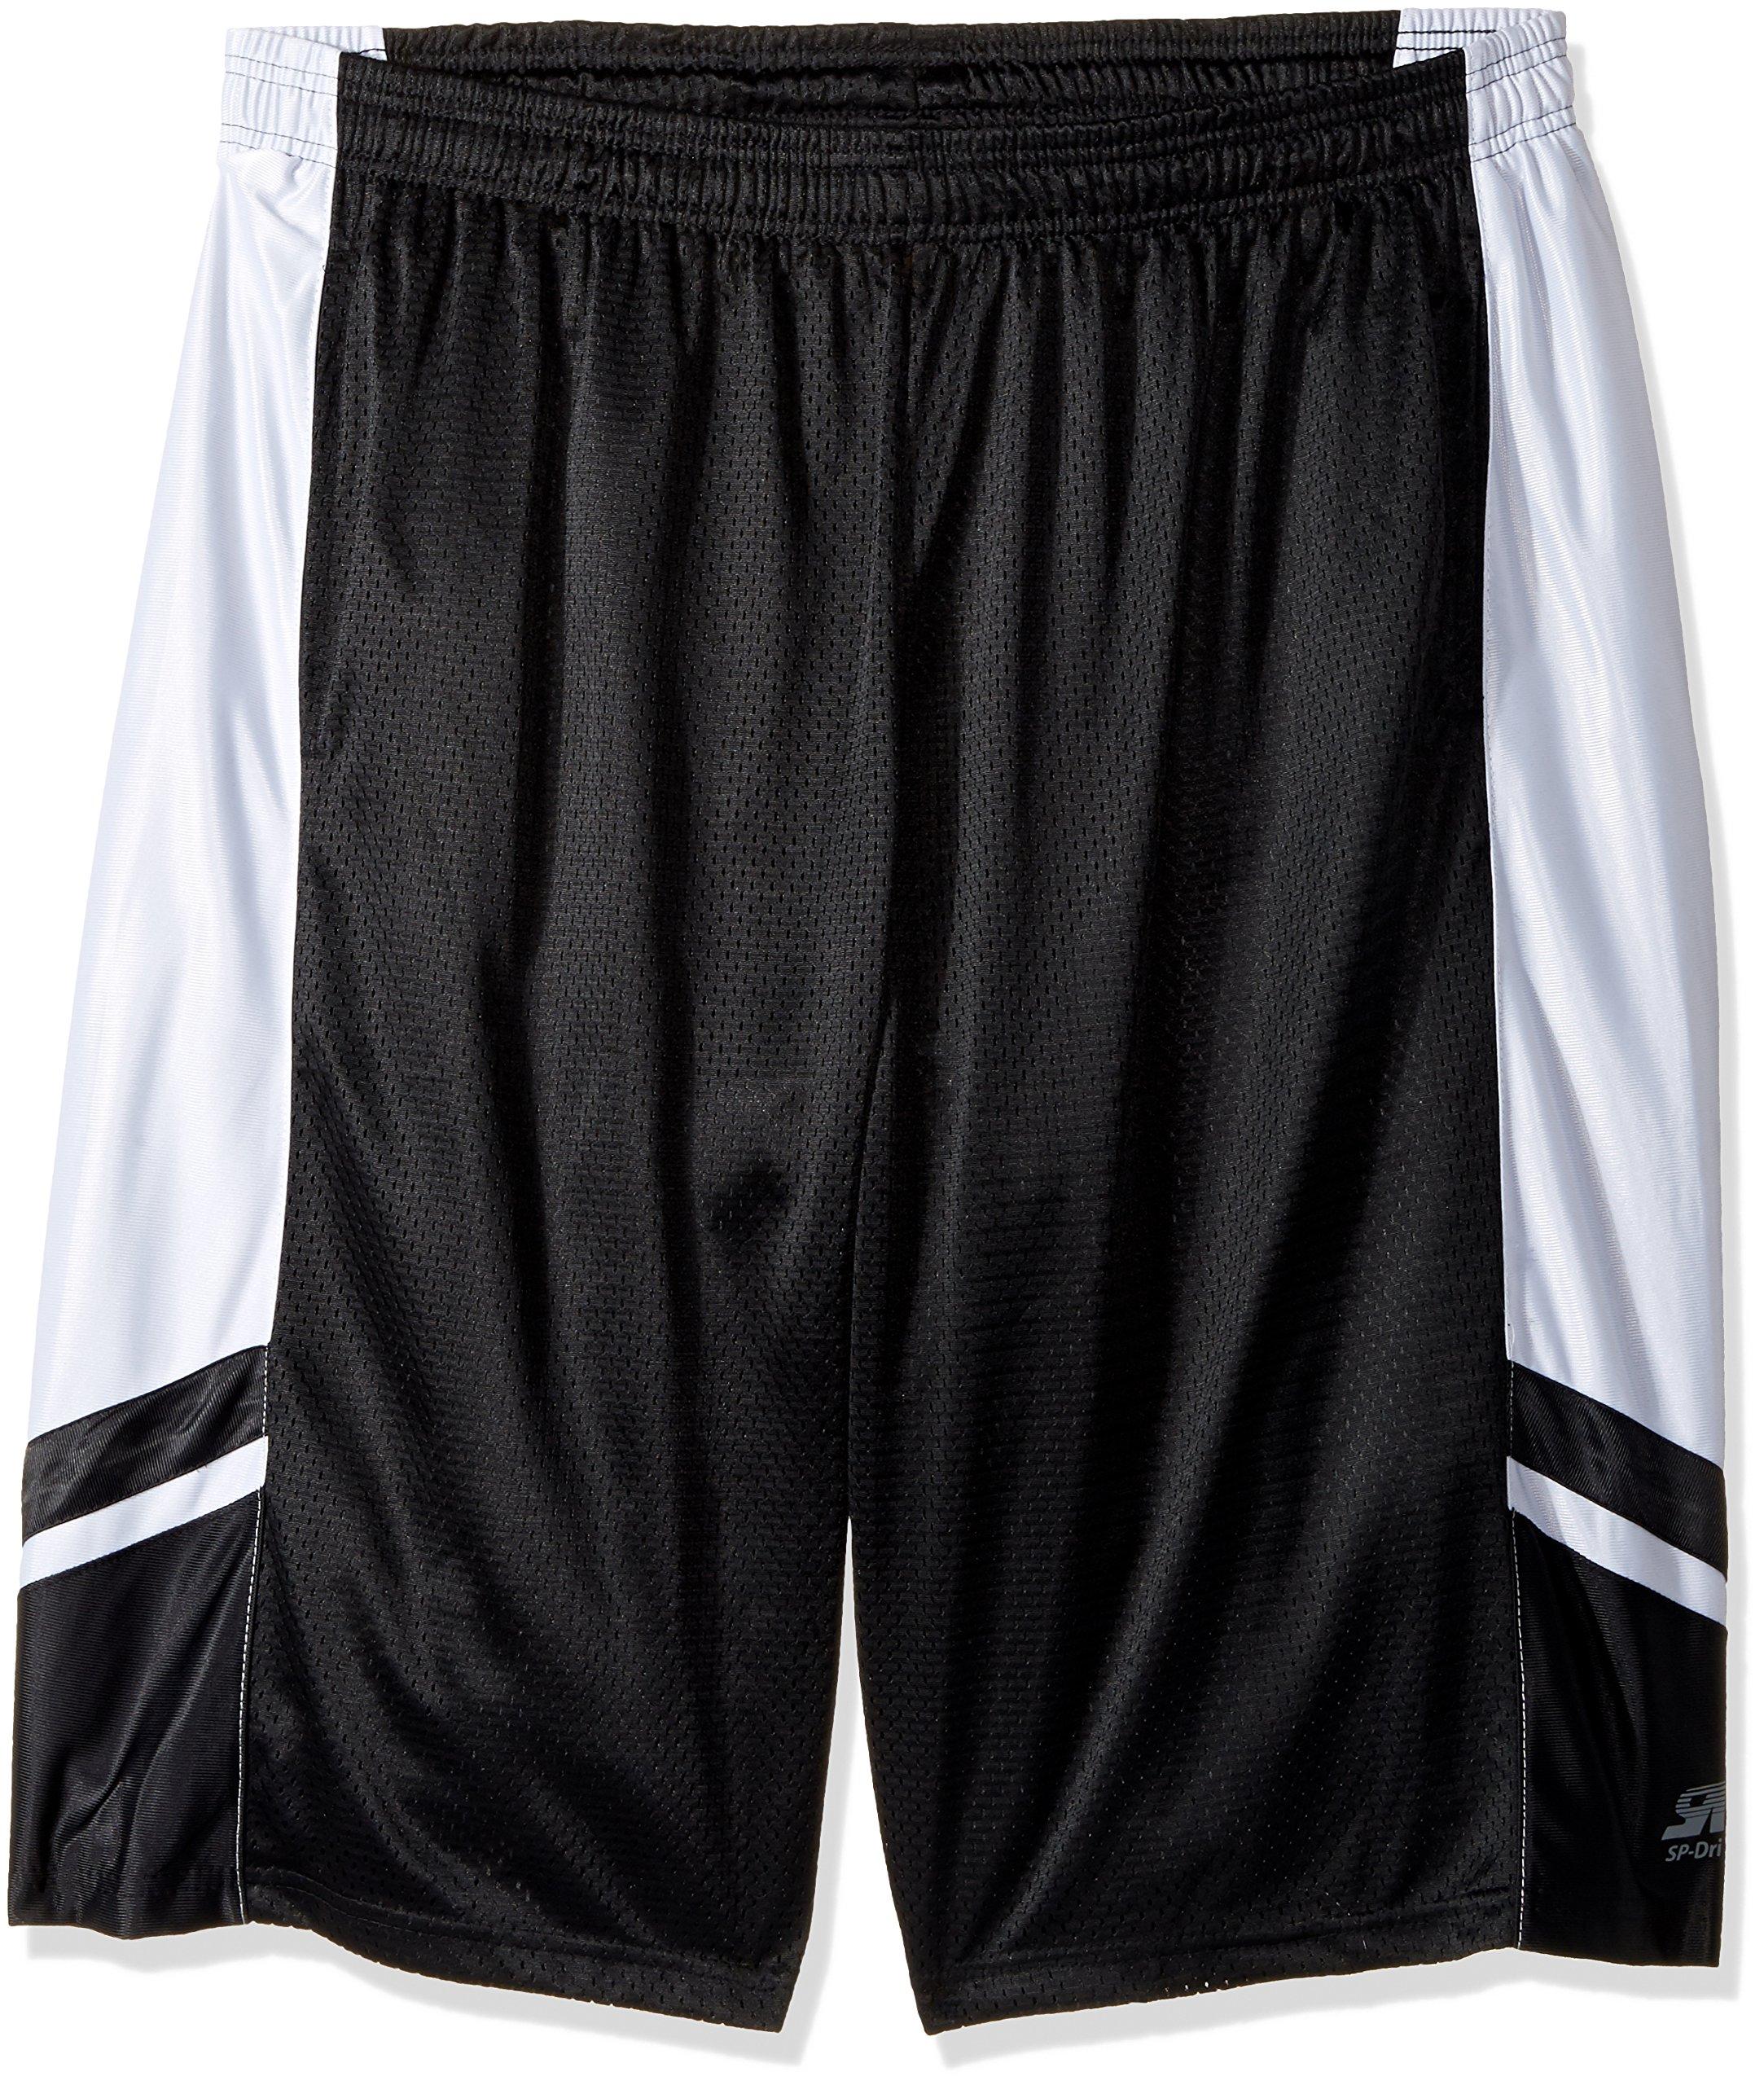 Southpole Men's Big and Tall Basic Basketball Mesh Shorts, Black, 5XB